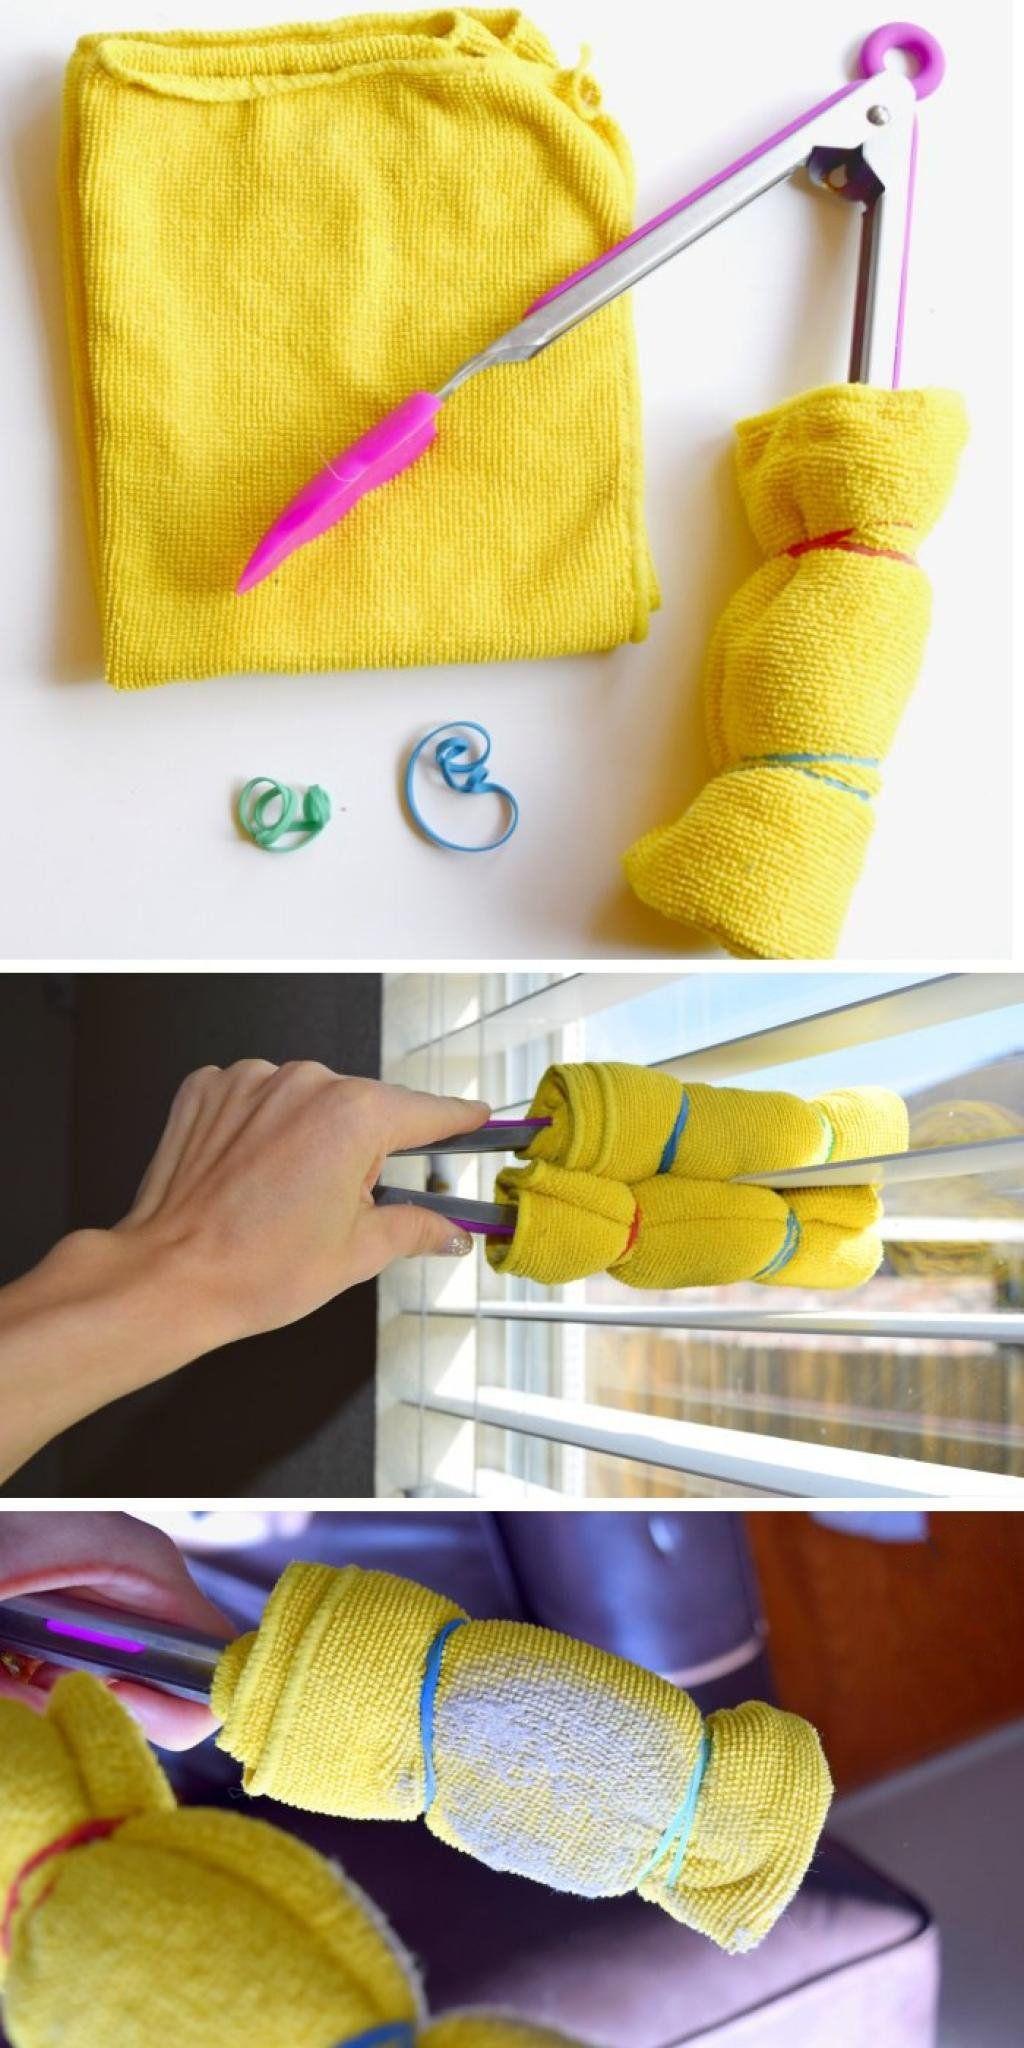 15 incre bles trucos de limpieza que seguramente no - Ikea pinzas cocina ...